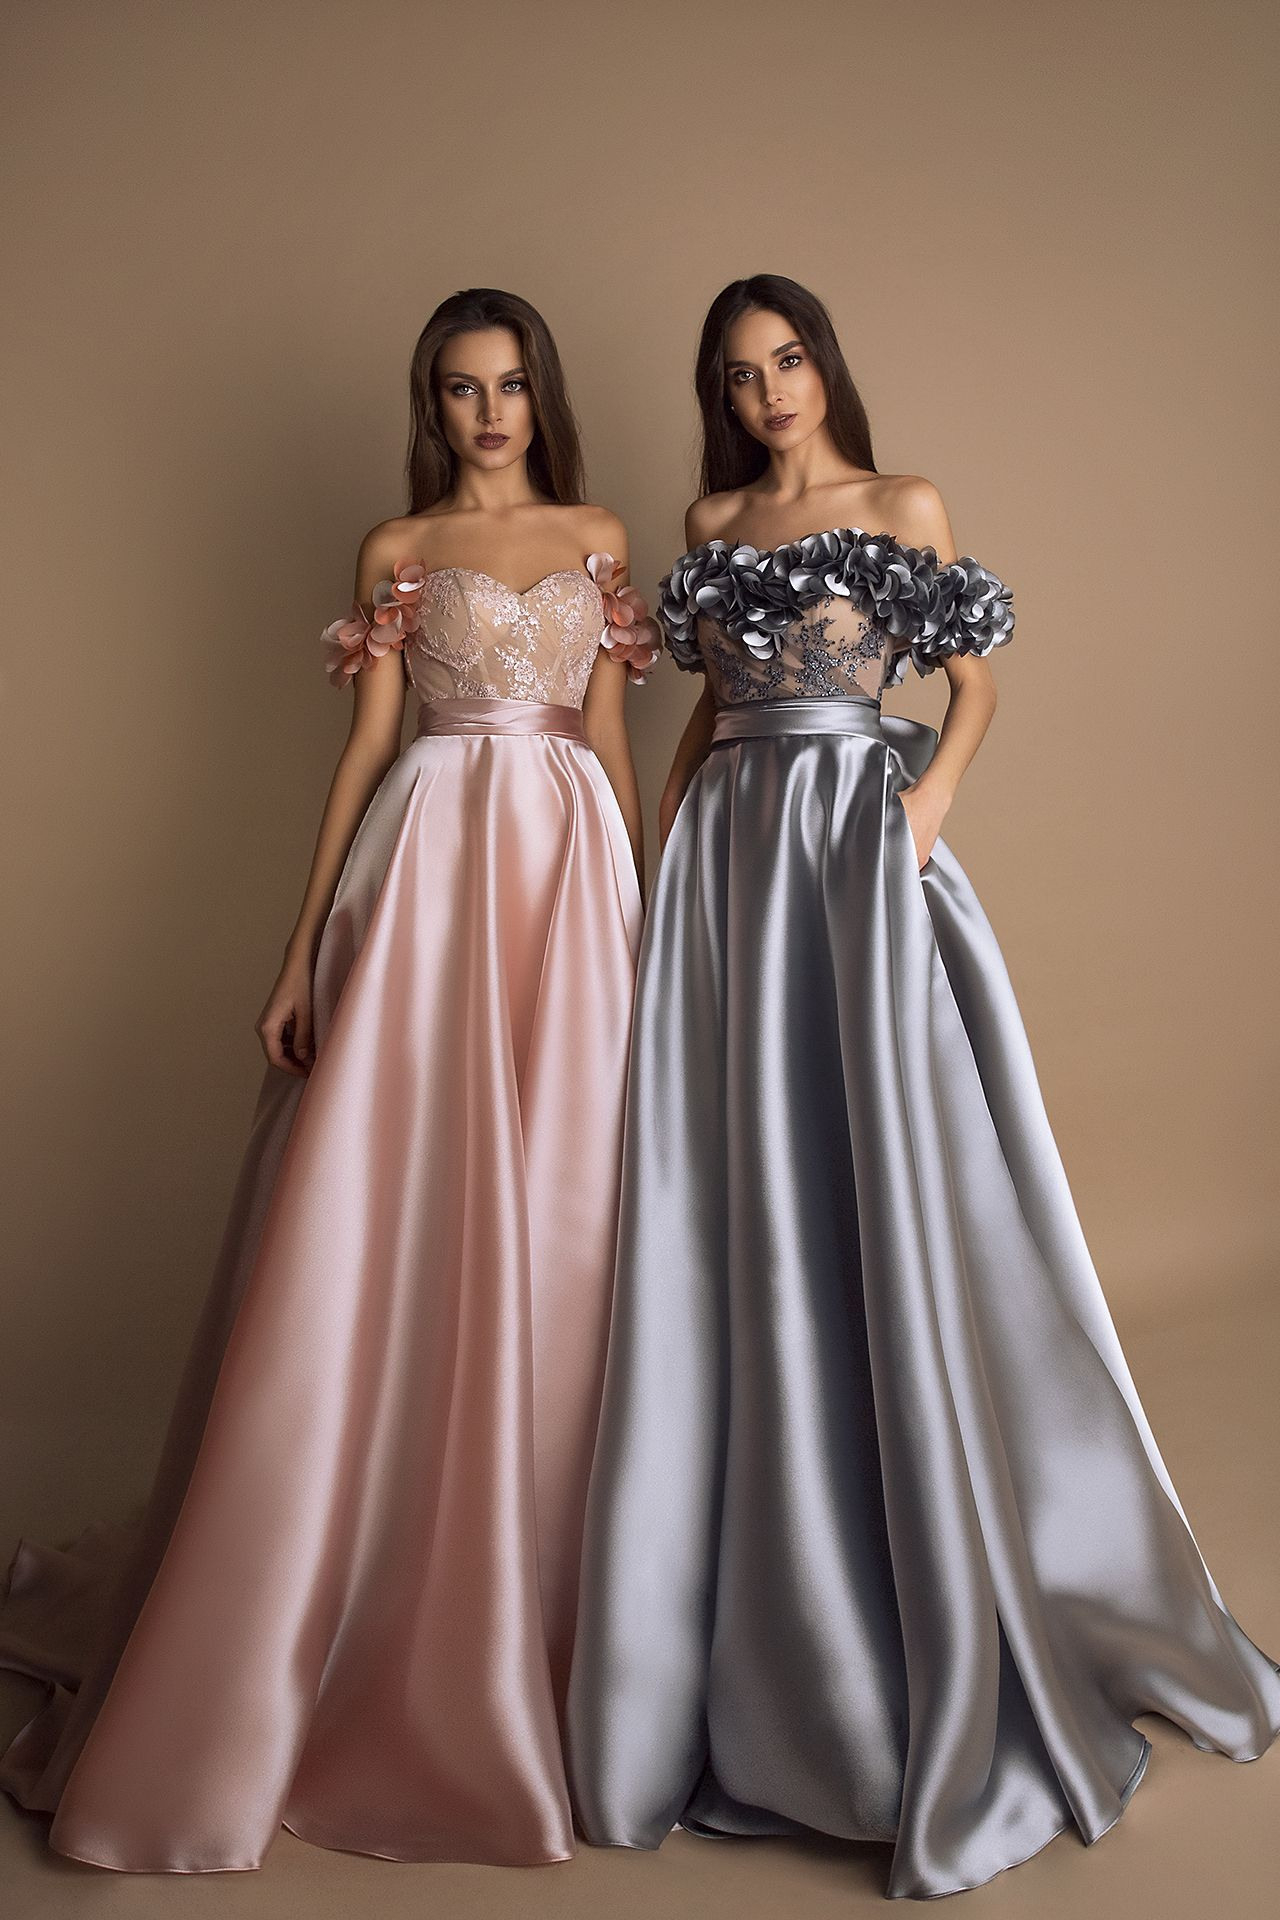 13 Genial Abendkleid Xs Lang Bester Preis13 Schön Abendkleid Xs Lang Stylish